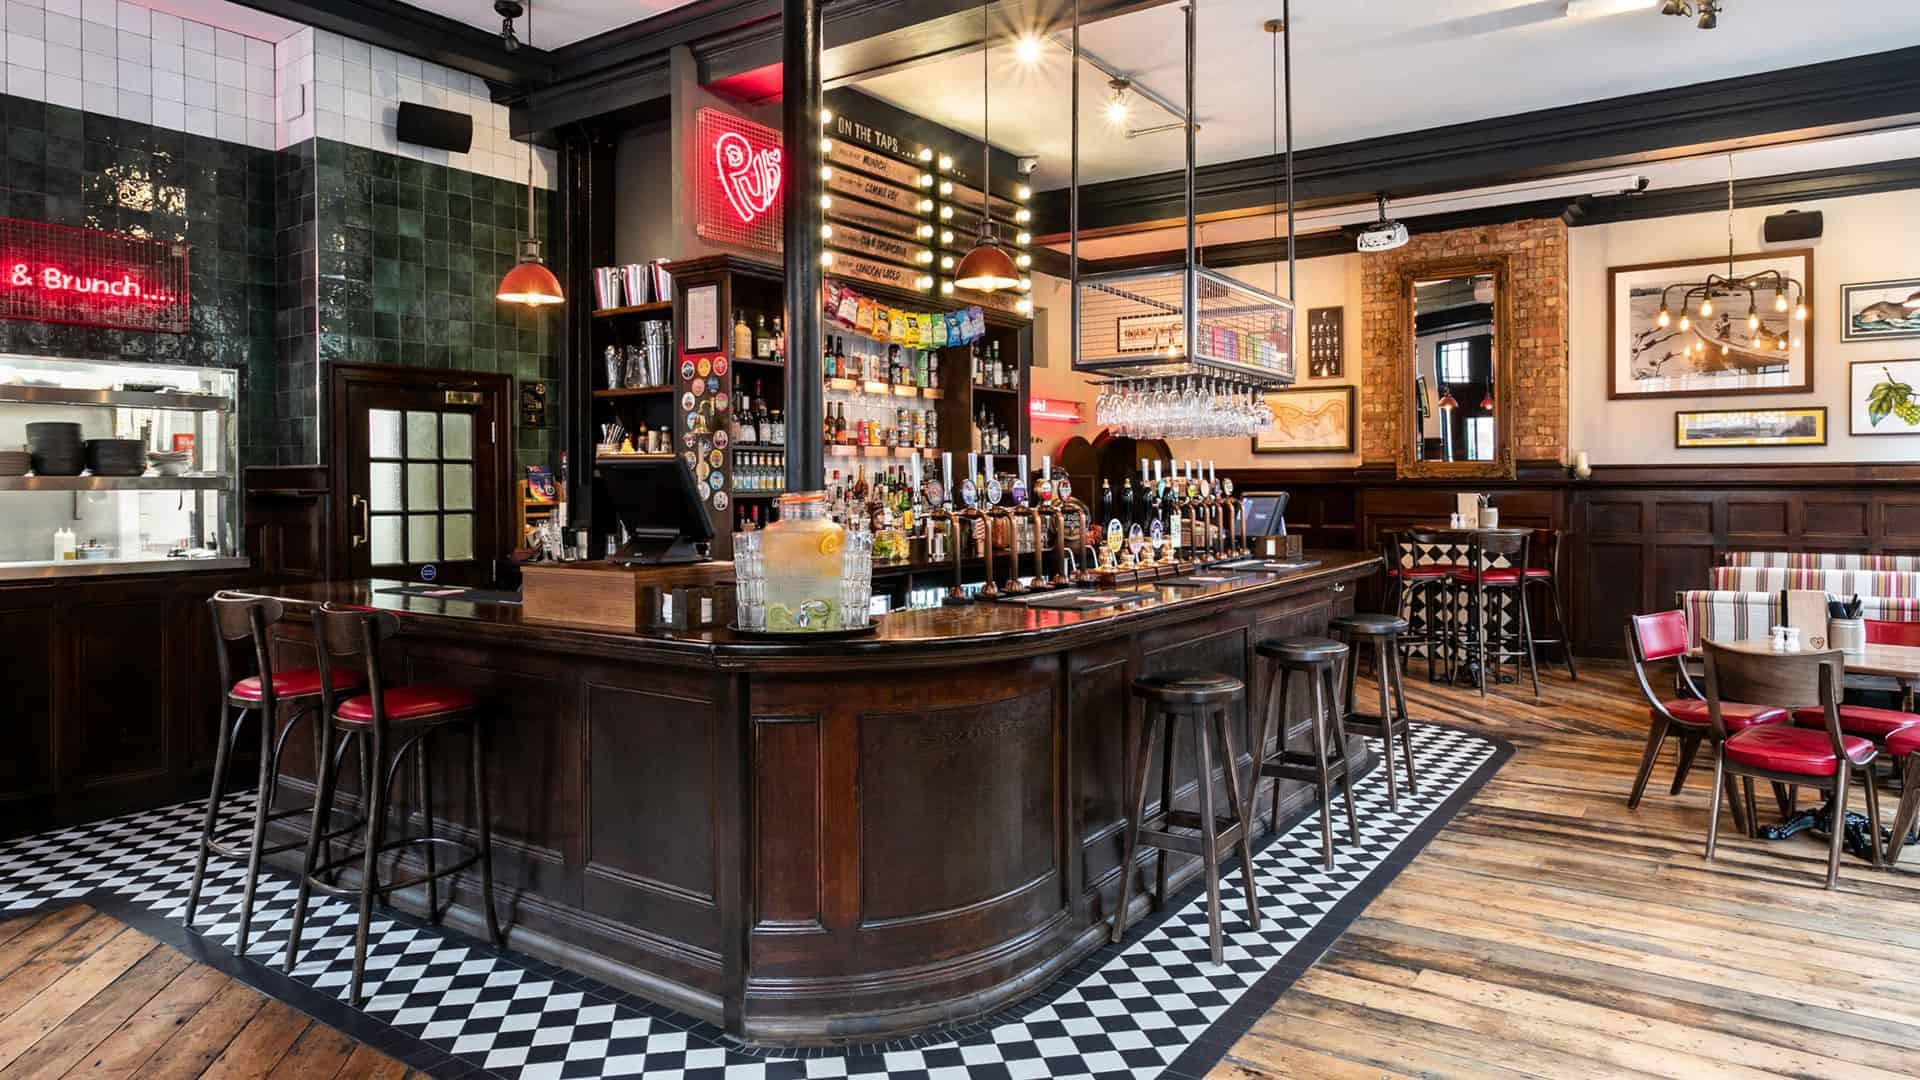 The Rose and Crown – London Bridge Pub